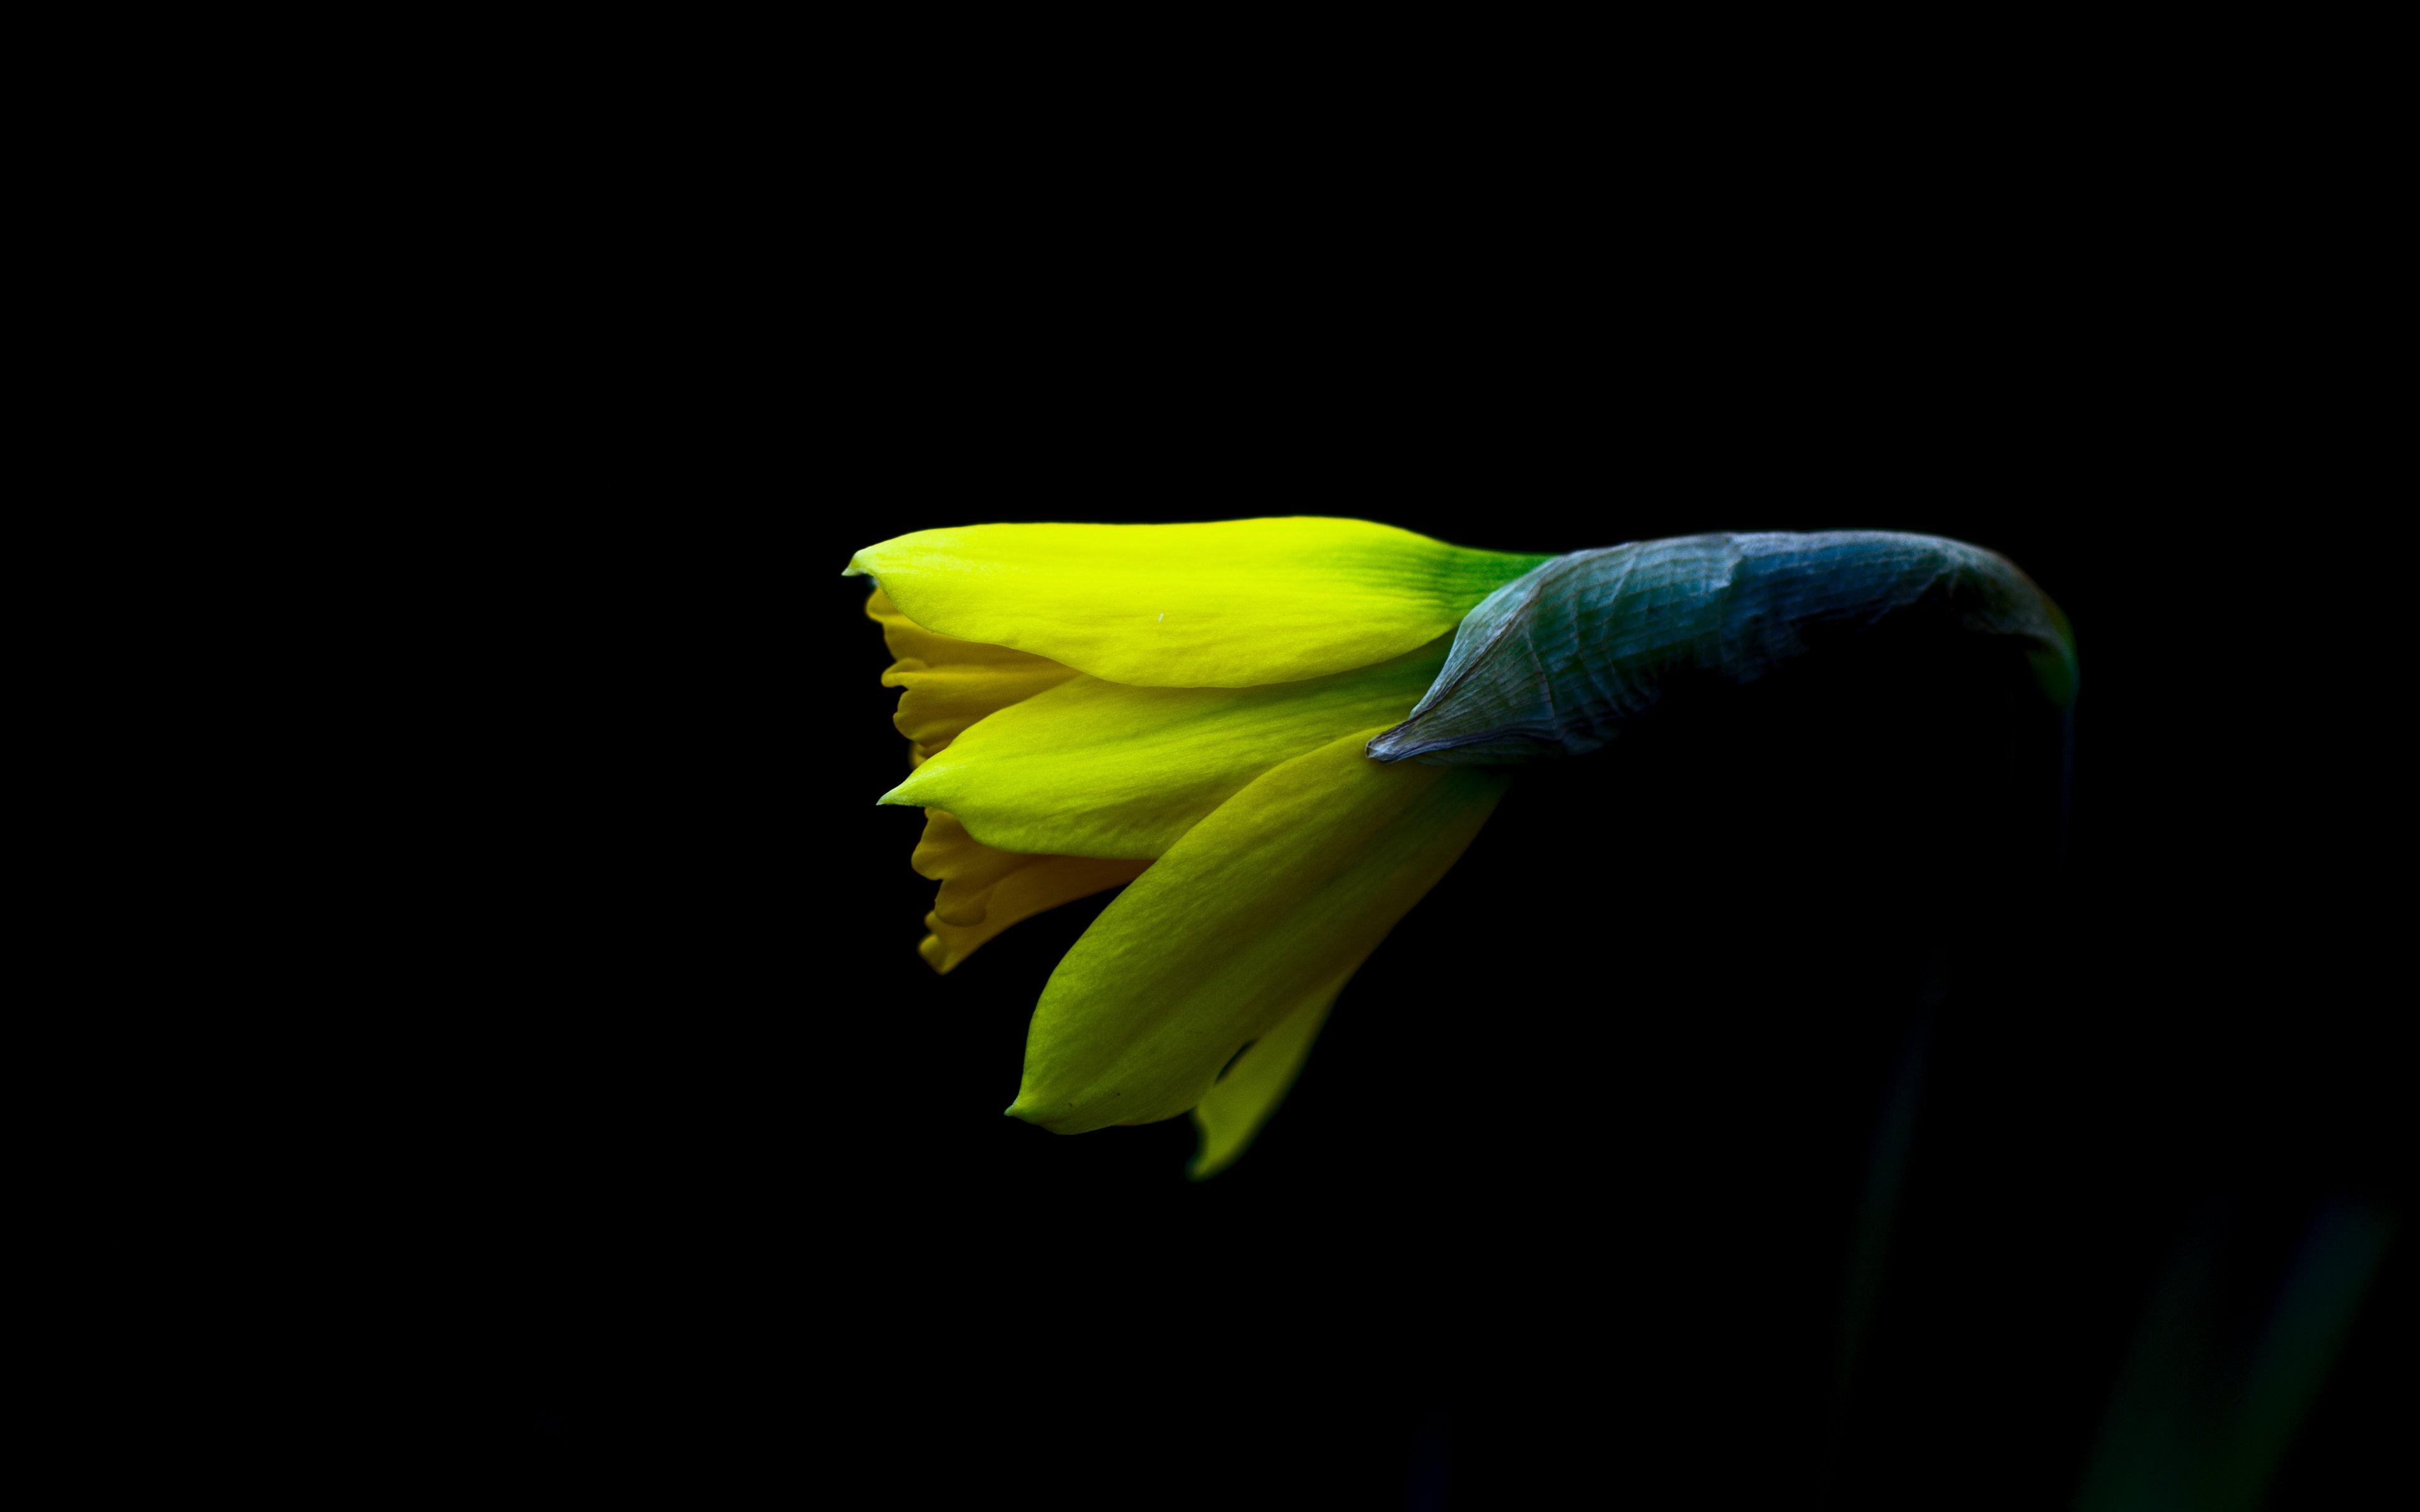 Spring by Peter Apas